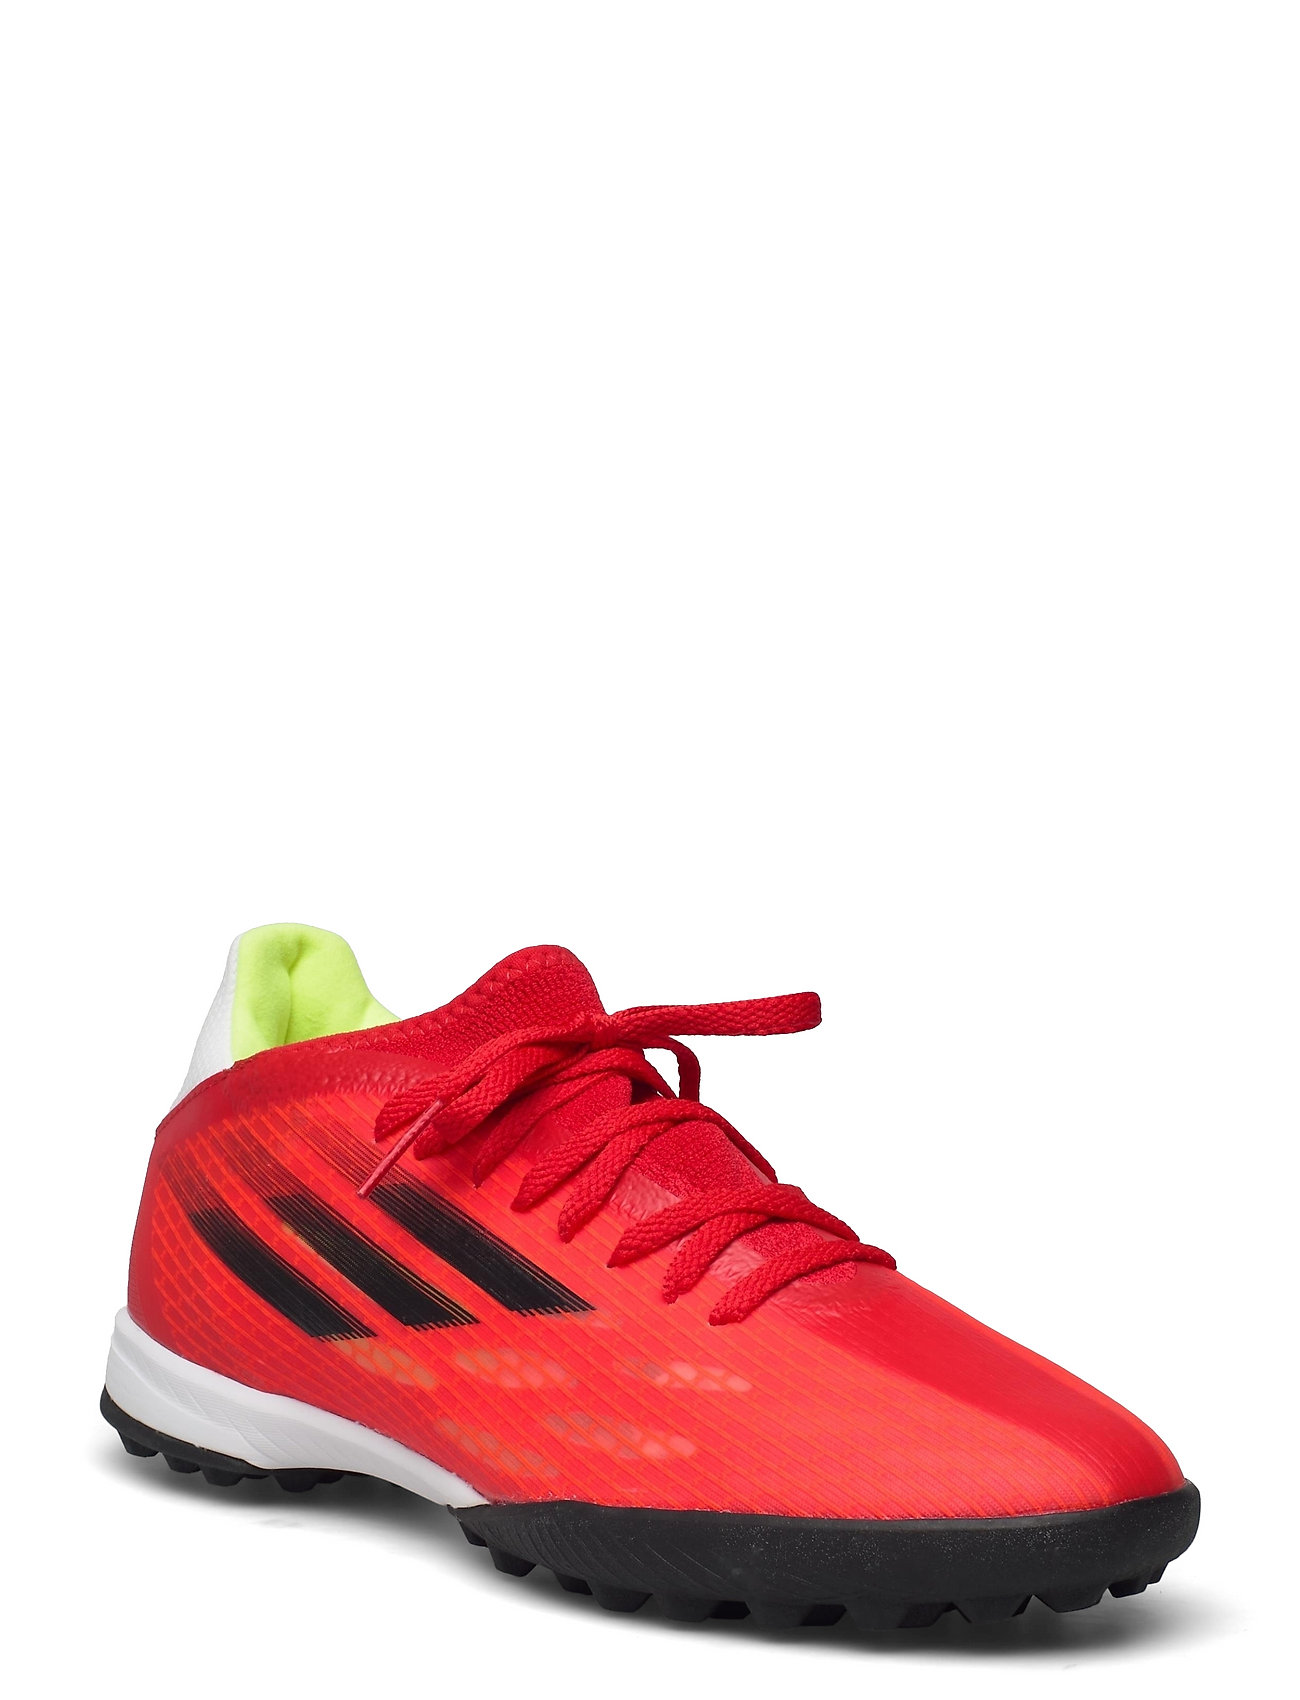 X Speedflow.3 Turf Boots Q3q4 21 Shoes Sport Shoes Football Boots Rød Adidas Performance